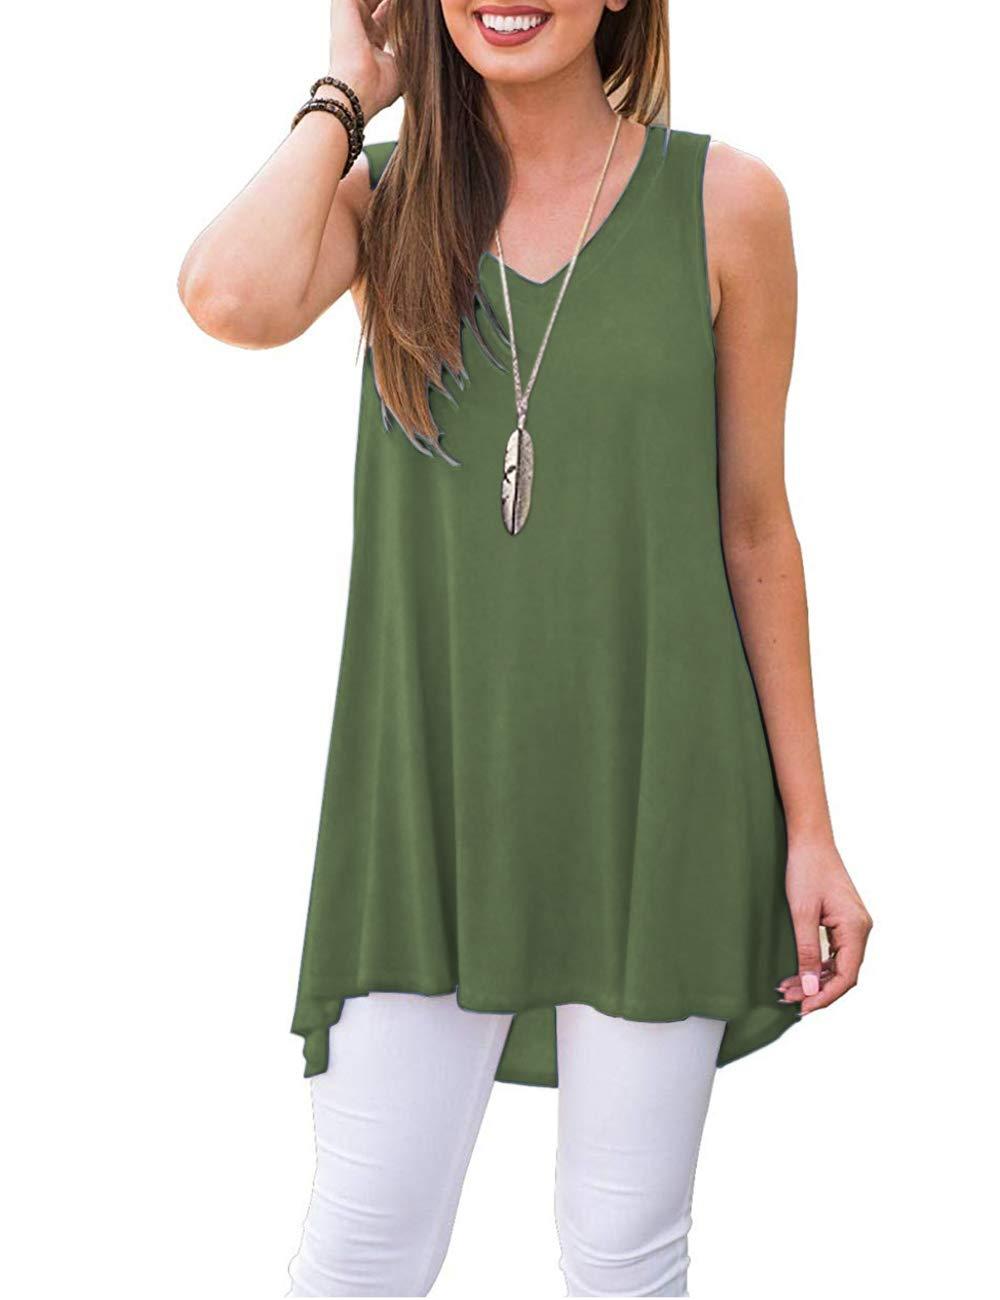 WNEEDU Women's Summer Sleeveless Tunic Casual V-Neck T-Shirt Tank Tops Blouse